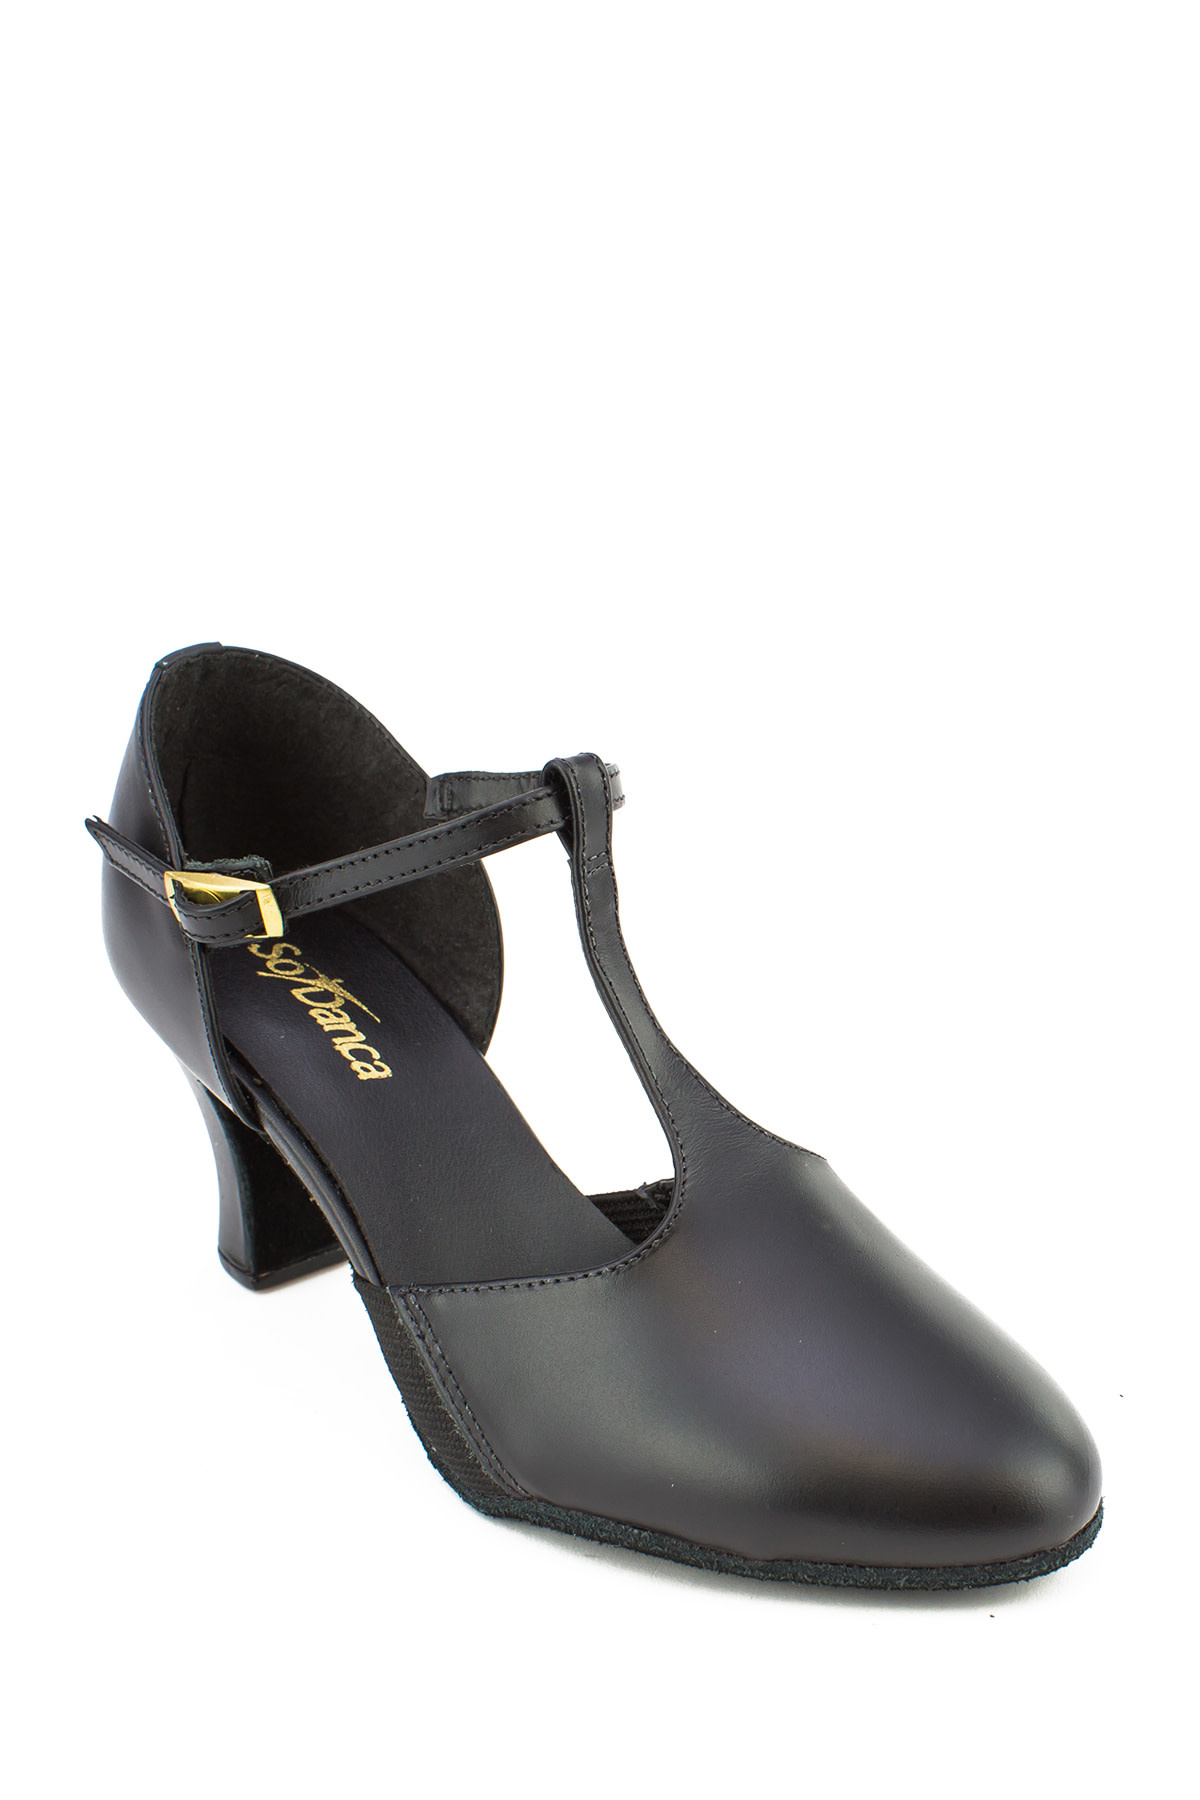 "So Danca Character Shoes So Danca CH-57, Leather Upper, Suede sole, 2.5"" Heel"